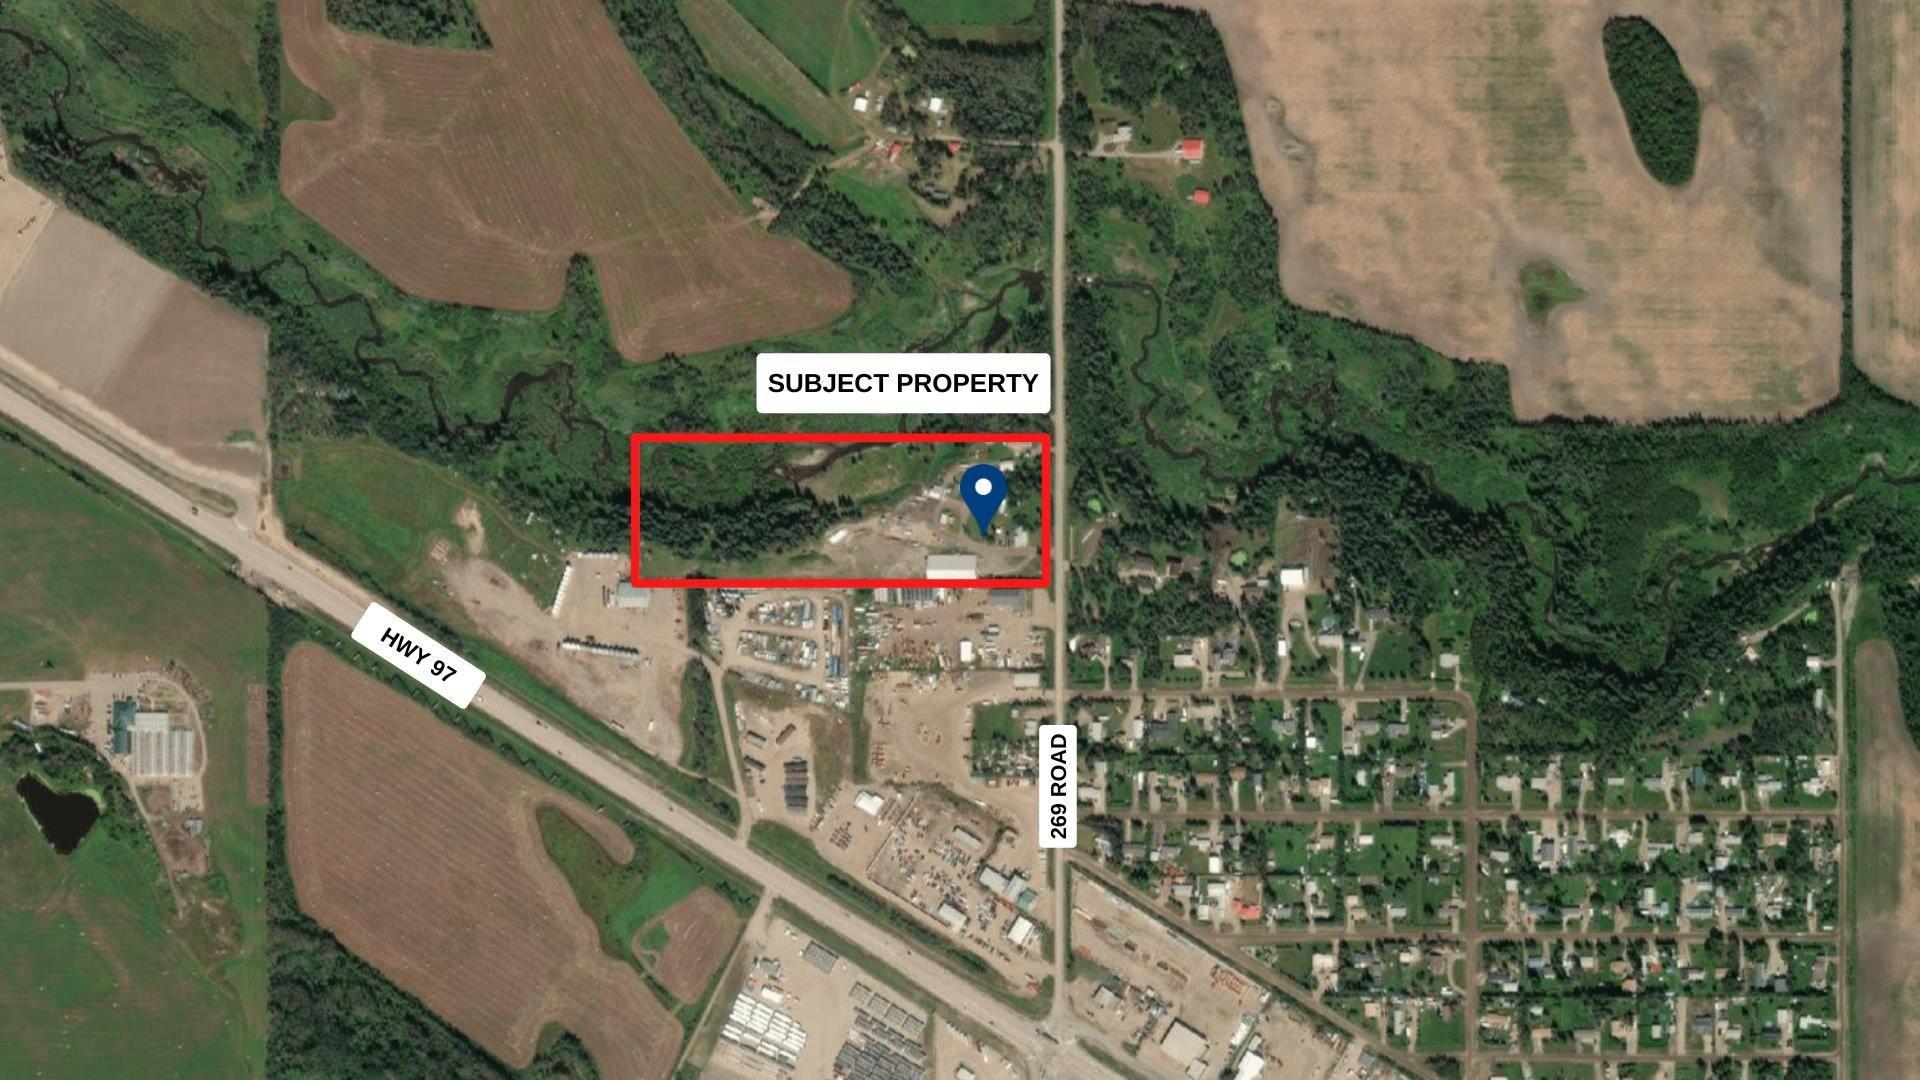 Main Photo: 11399 269 Road in Fort St. John: Fort St. John - Rural W 100th Industrial for sale (Fort St. John (Zone 60))  : MLS®# C8039009